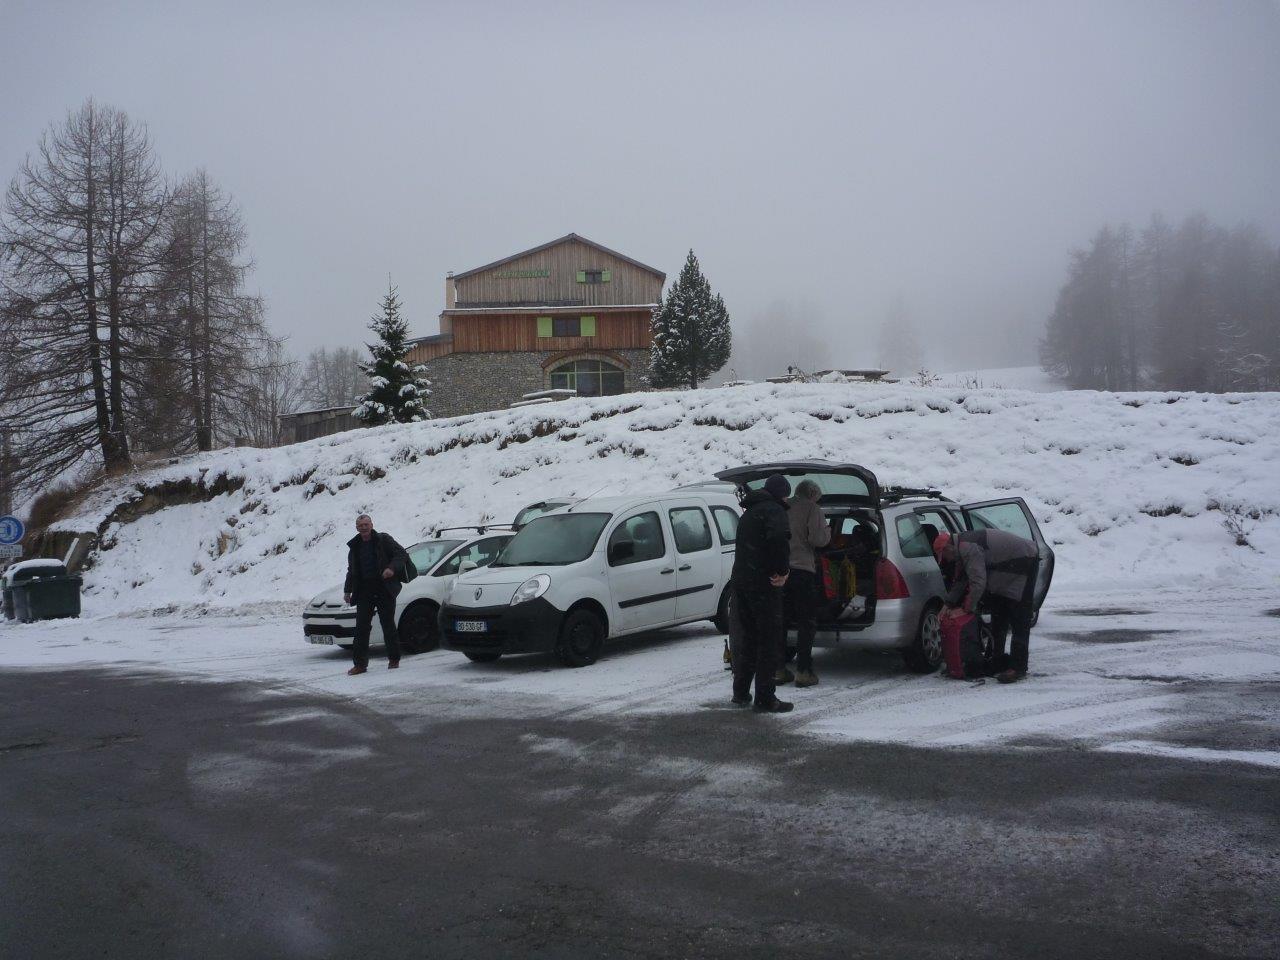 Col de la Couillole (1678 m) 15.30